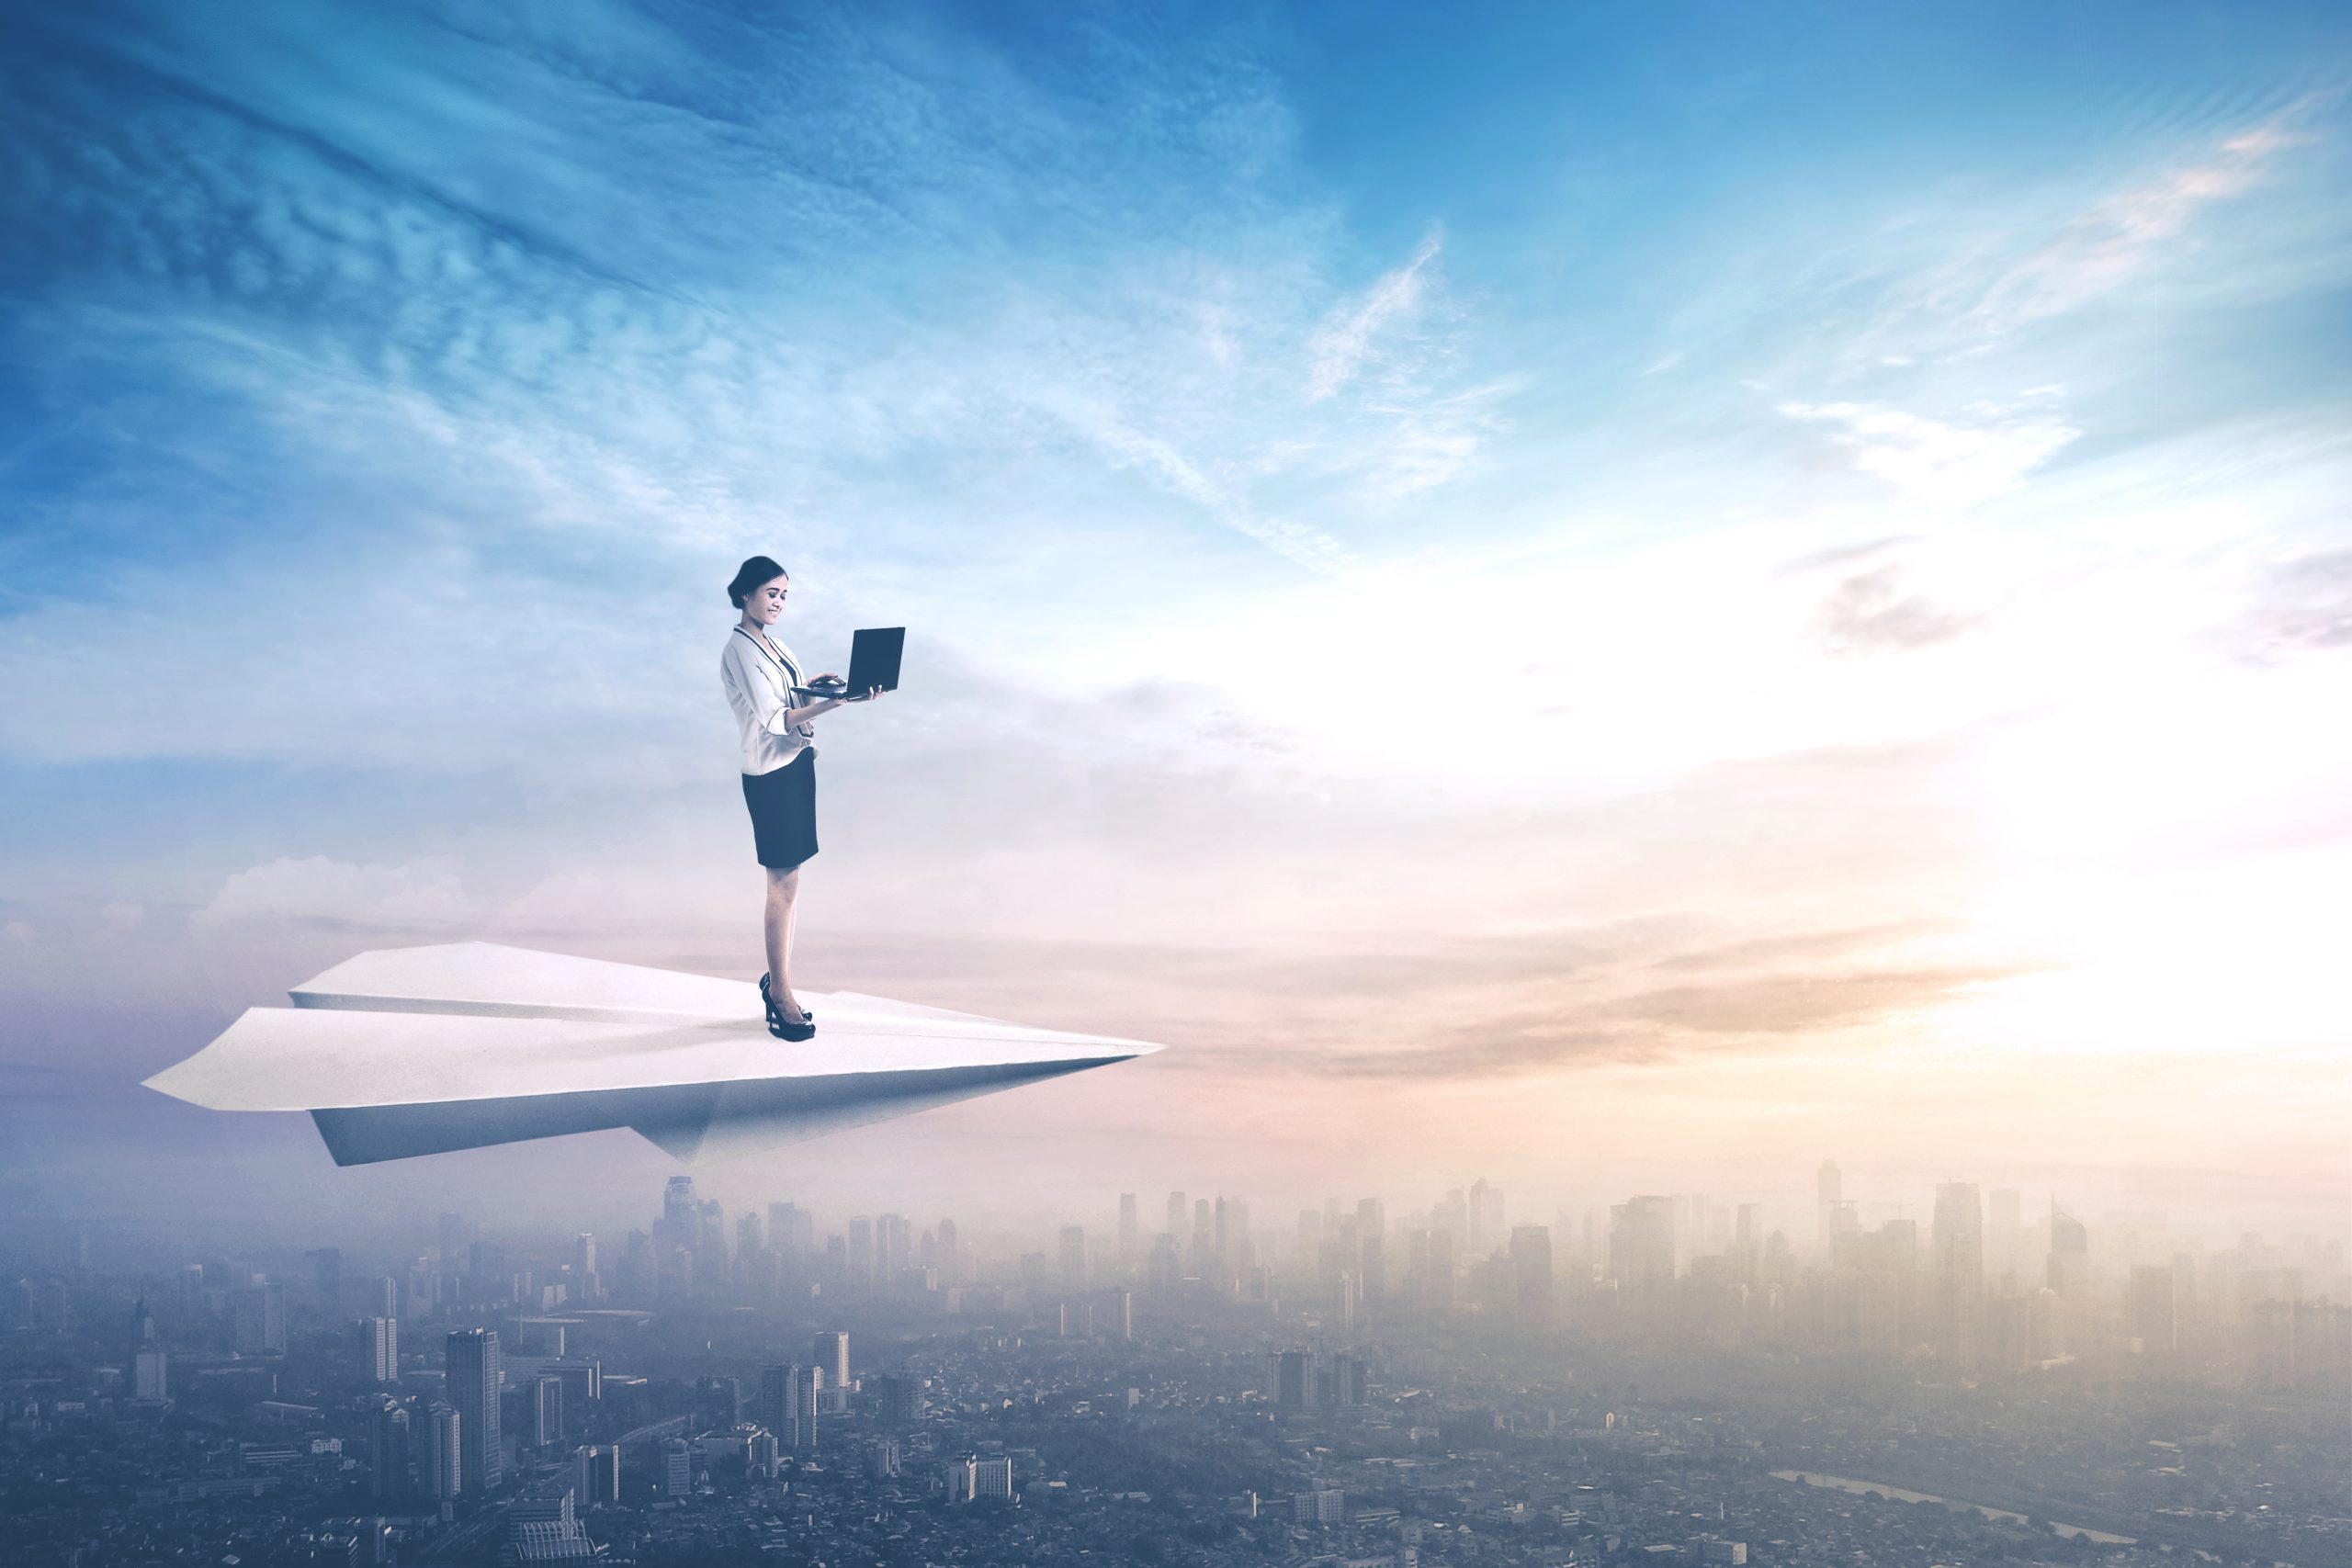 Businesswoman uses laptop on paper aeroplane